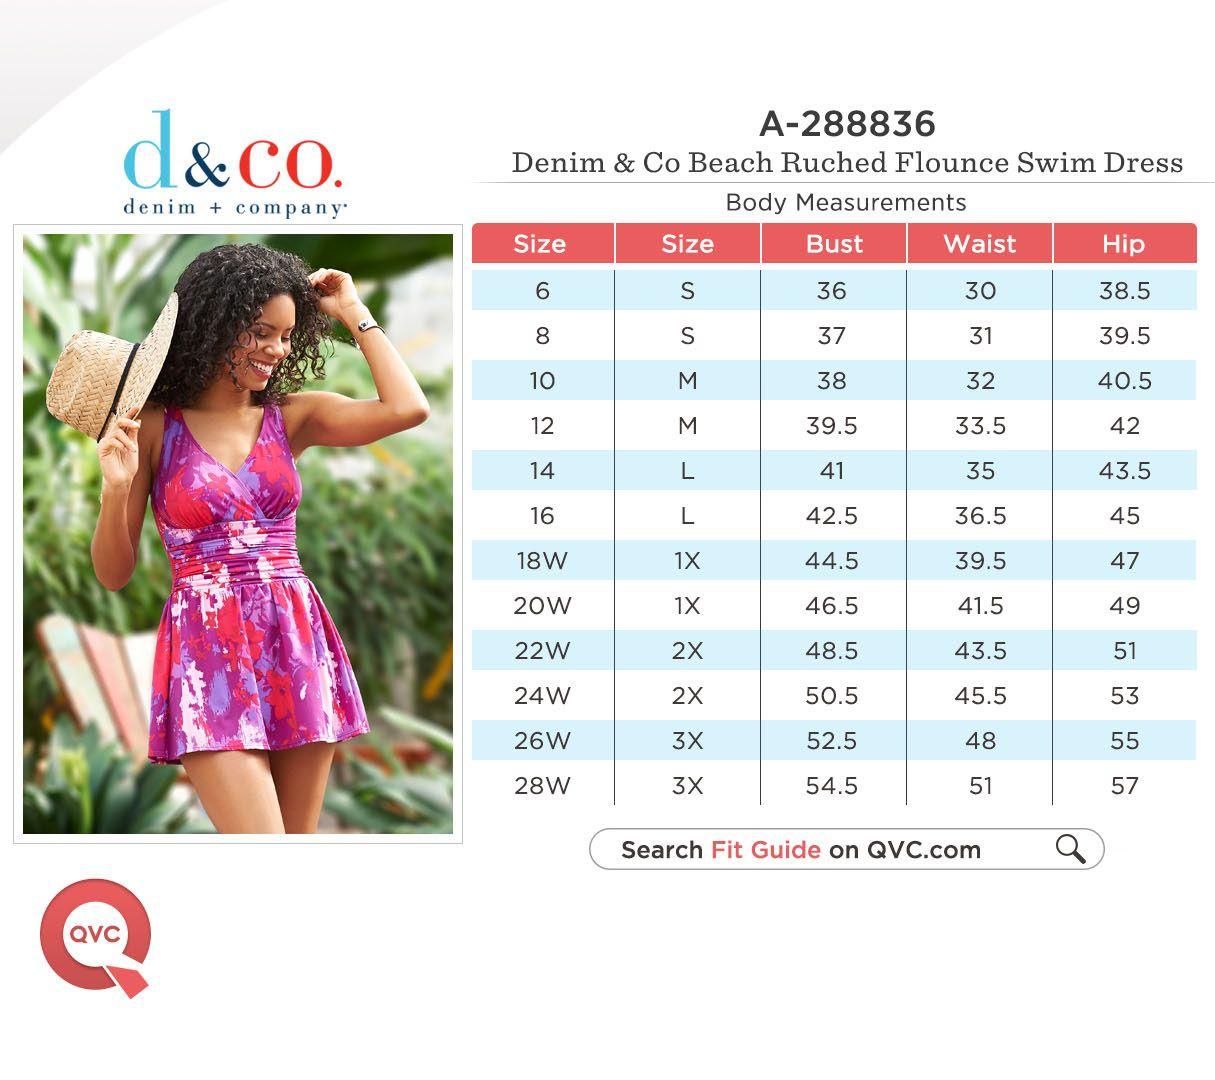 d8c43da361 Denim   Co. Beach Ruched Flounce Swim Dress - Page 1 — QVC.com